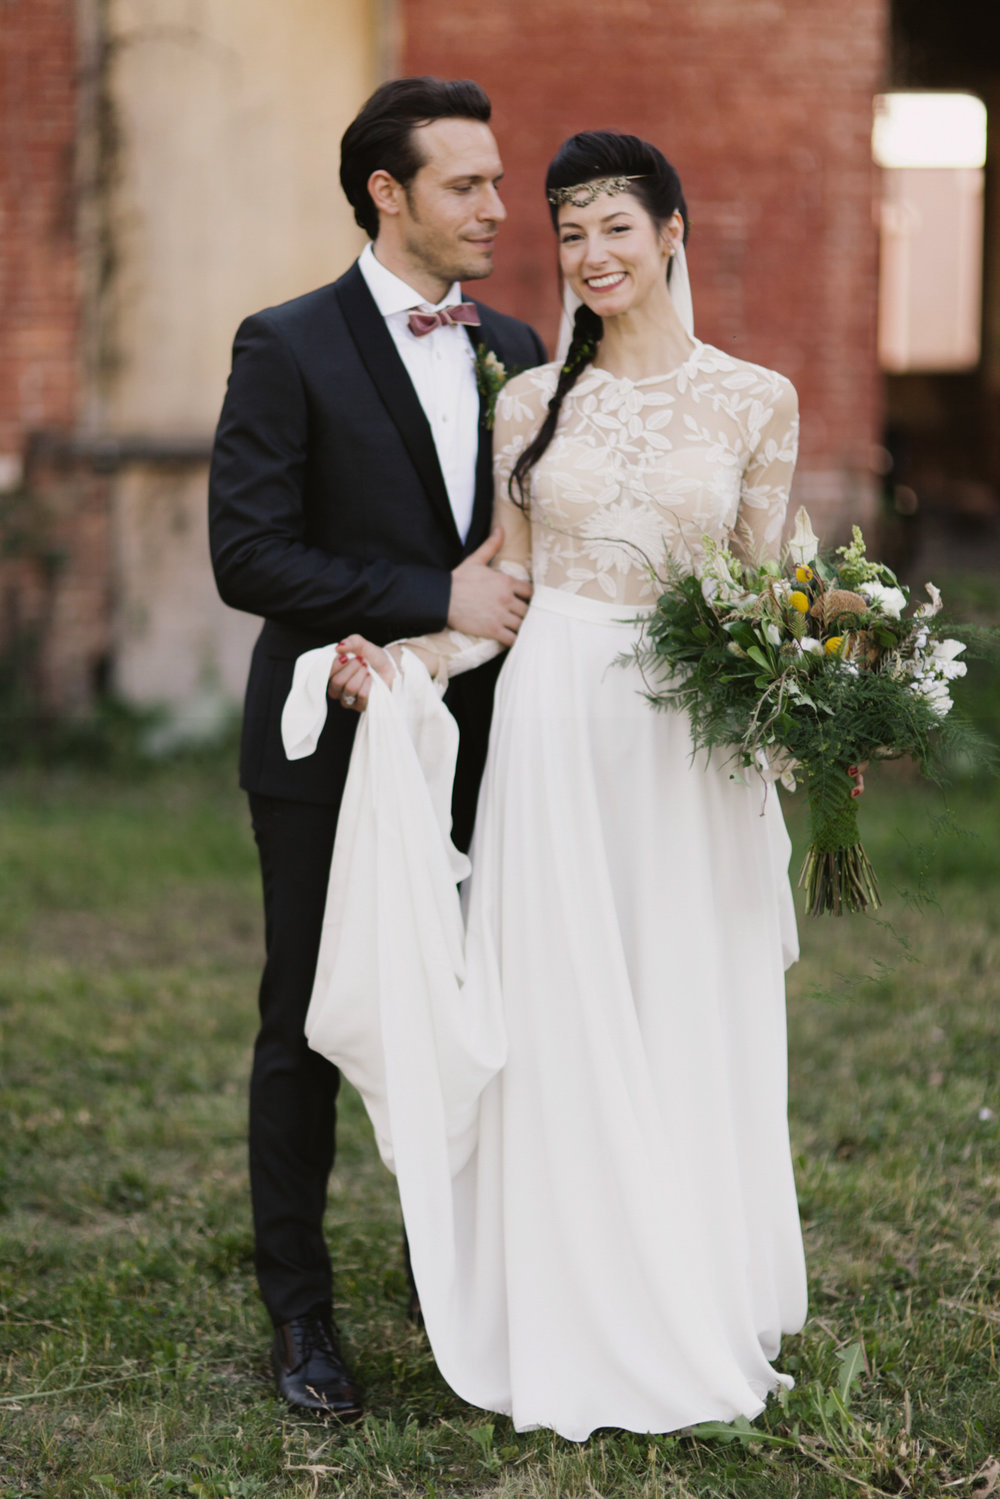 Kimberly-Coccagnia-Wedding-Photographer-135.JPG